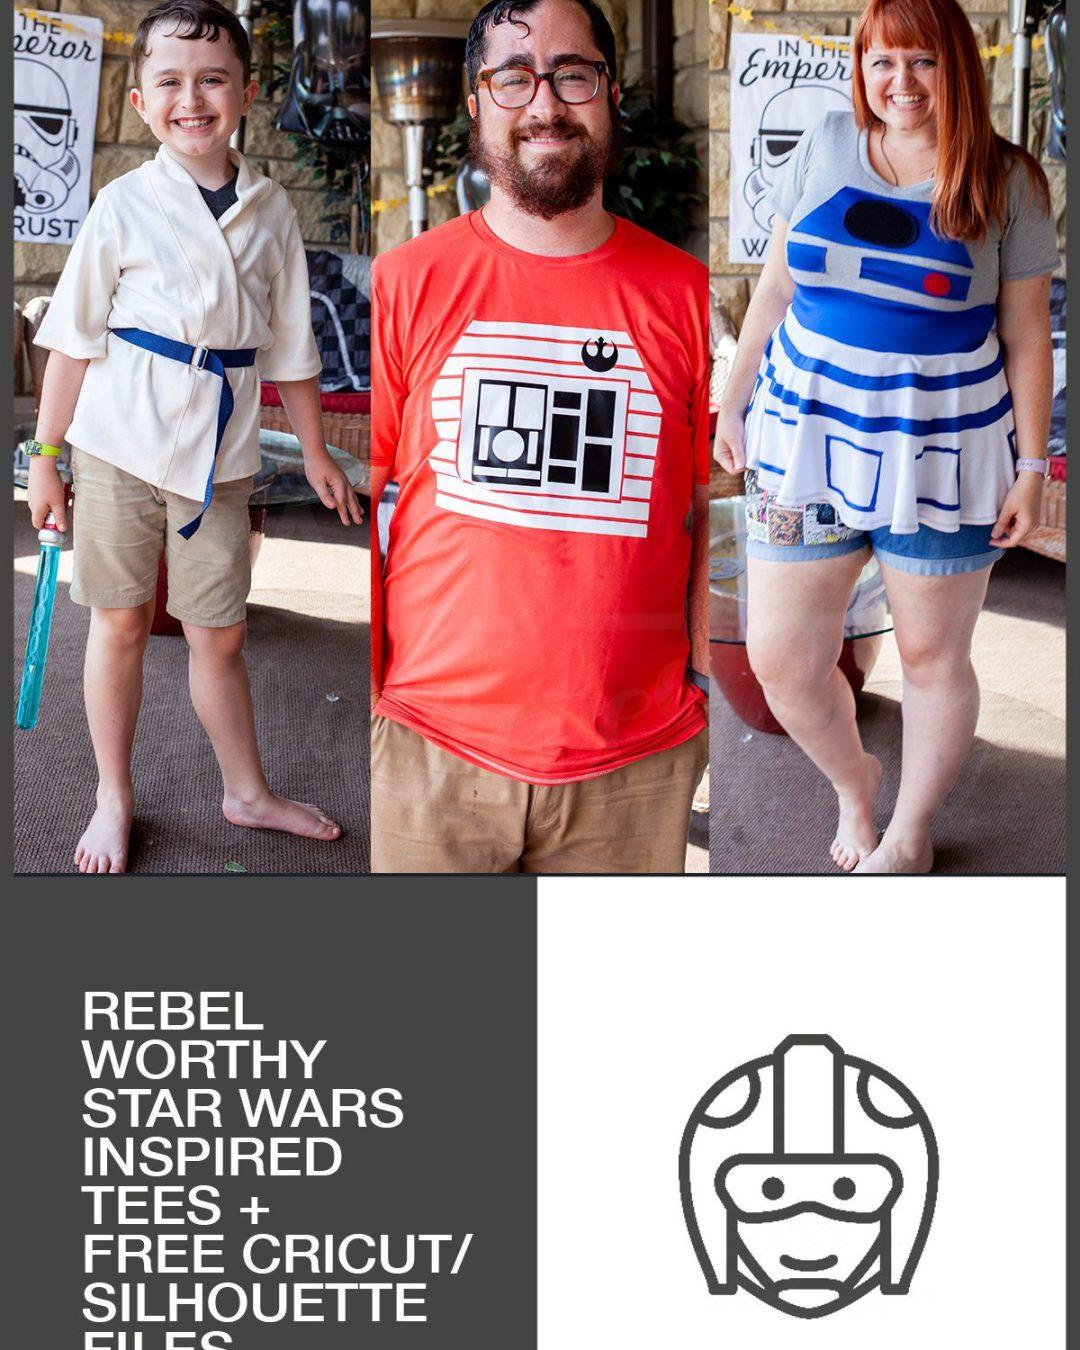 Rebel-Worthy Tees + FREE Download :: Star Wars Birthday Party